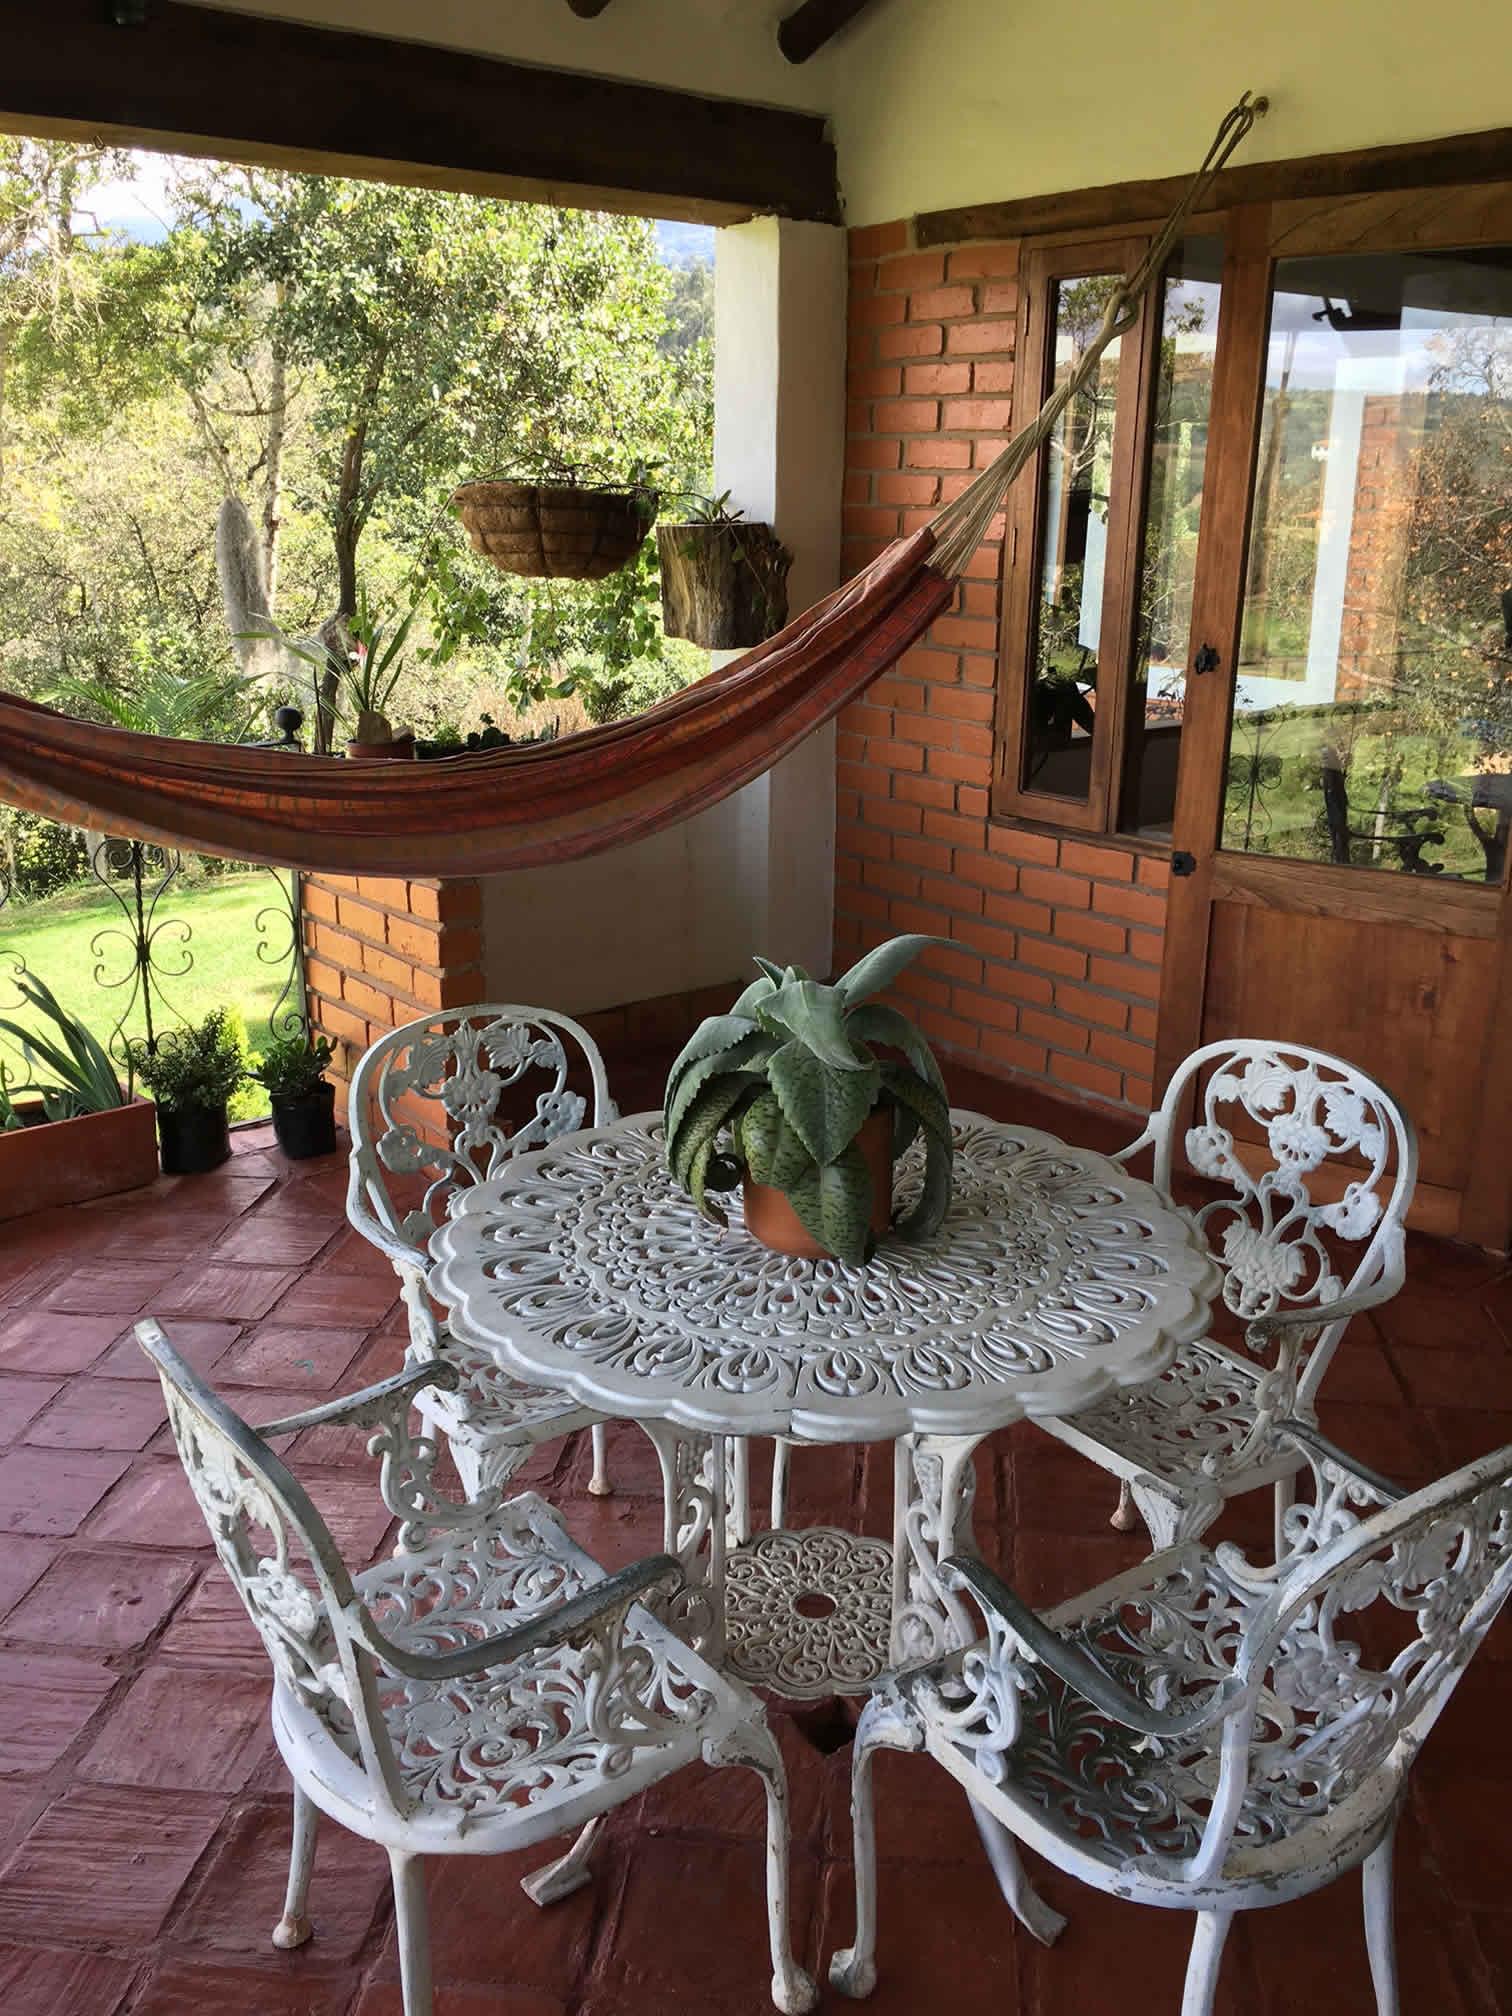 Alquiler cabaña El Paraíso en Villa de Leyva - terraza